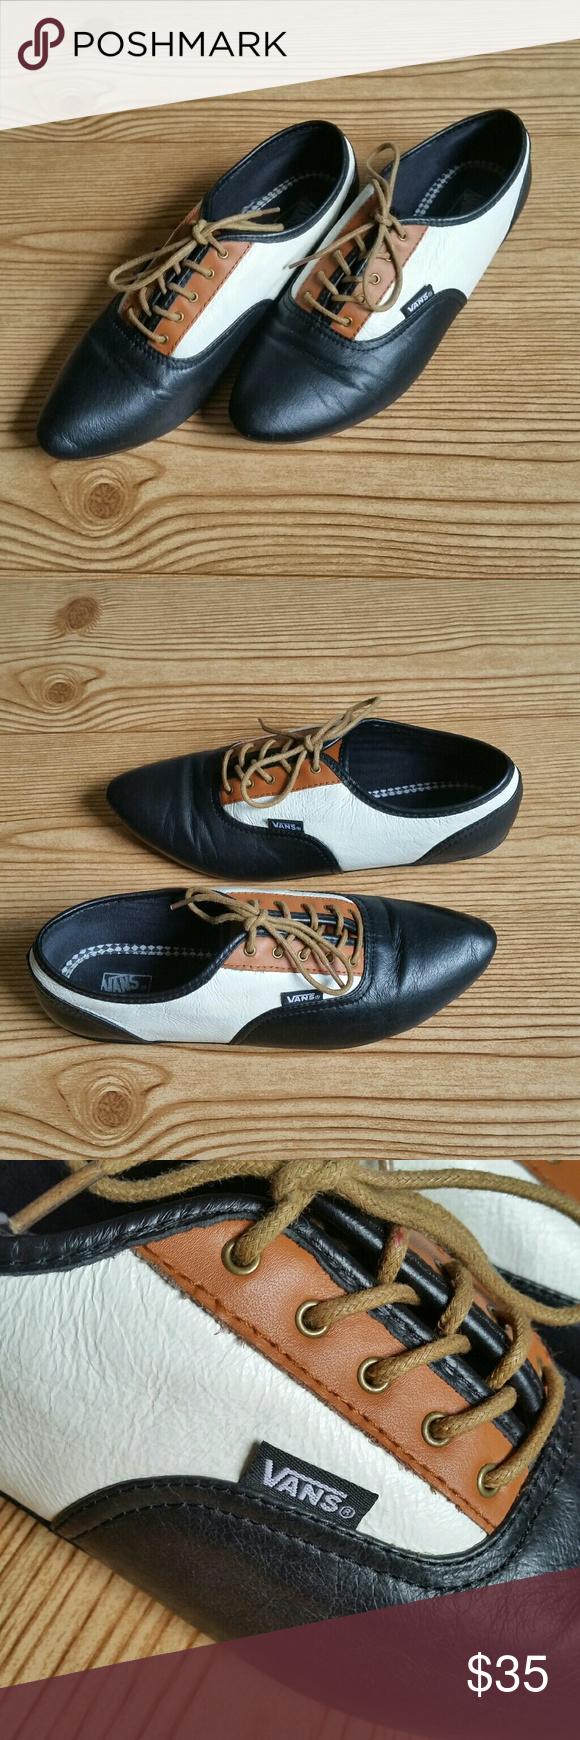 Vans Sophie Oxfords Vans retired saddle shoes. Vintage style shoes. Women  Size 7 Black aa1733c18